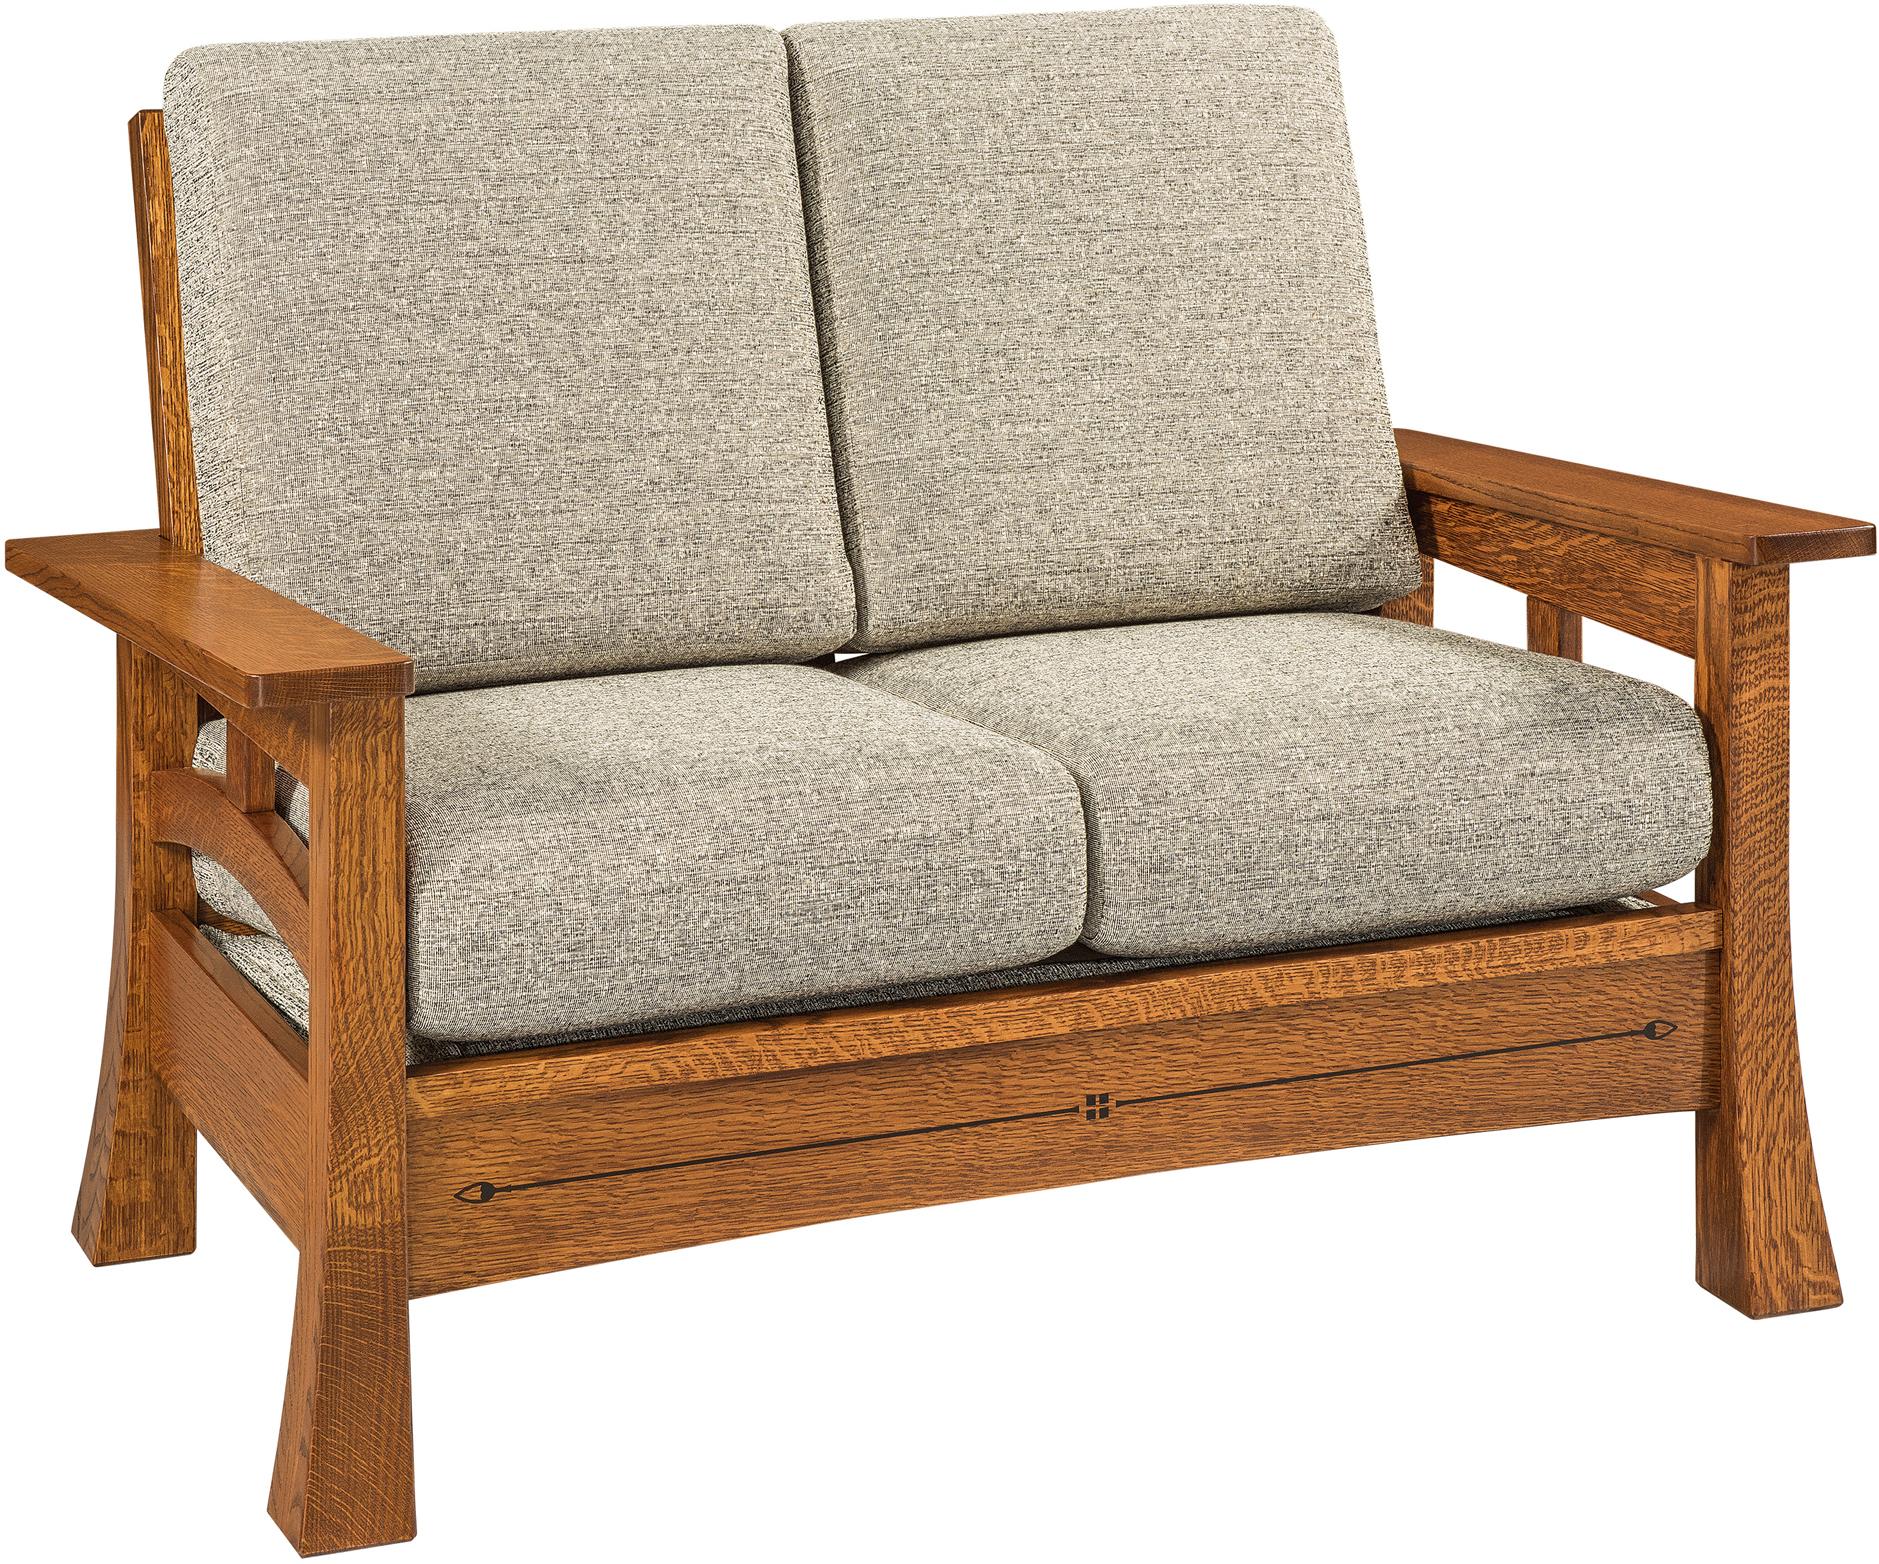 Brady Sofa Loveseat and Chair Set